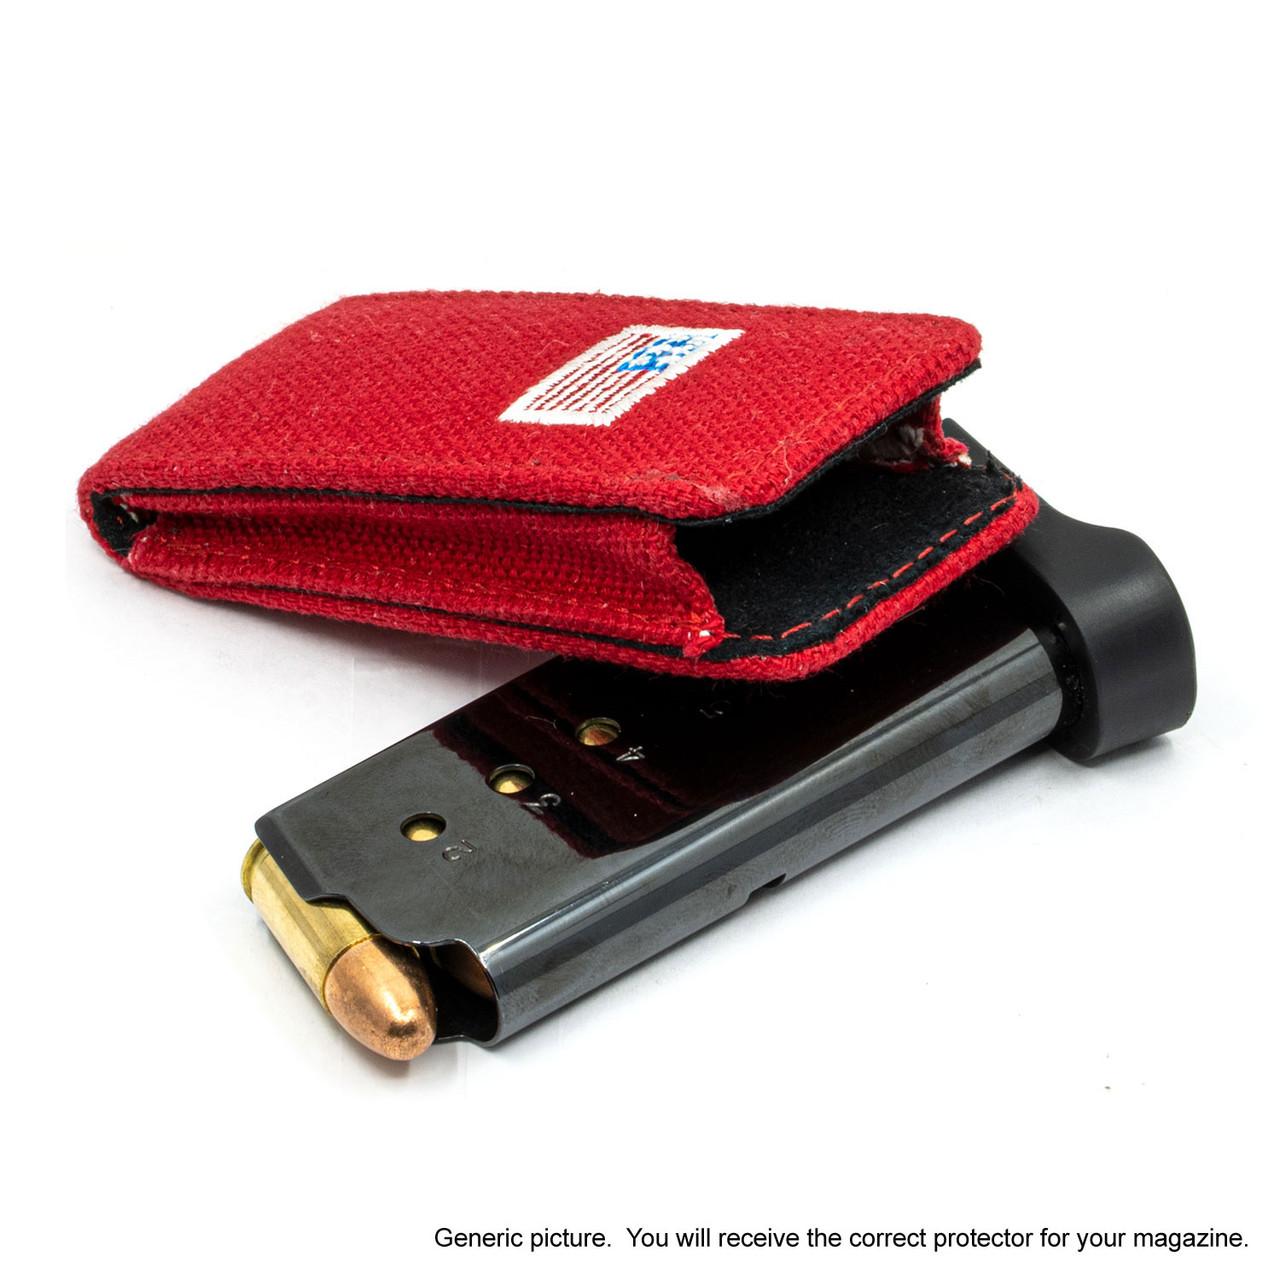 CZ 2075 Rami Red Canvas Flag Magazine Pocket Protector